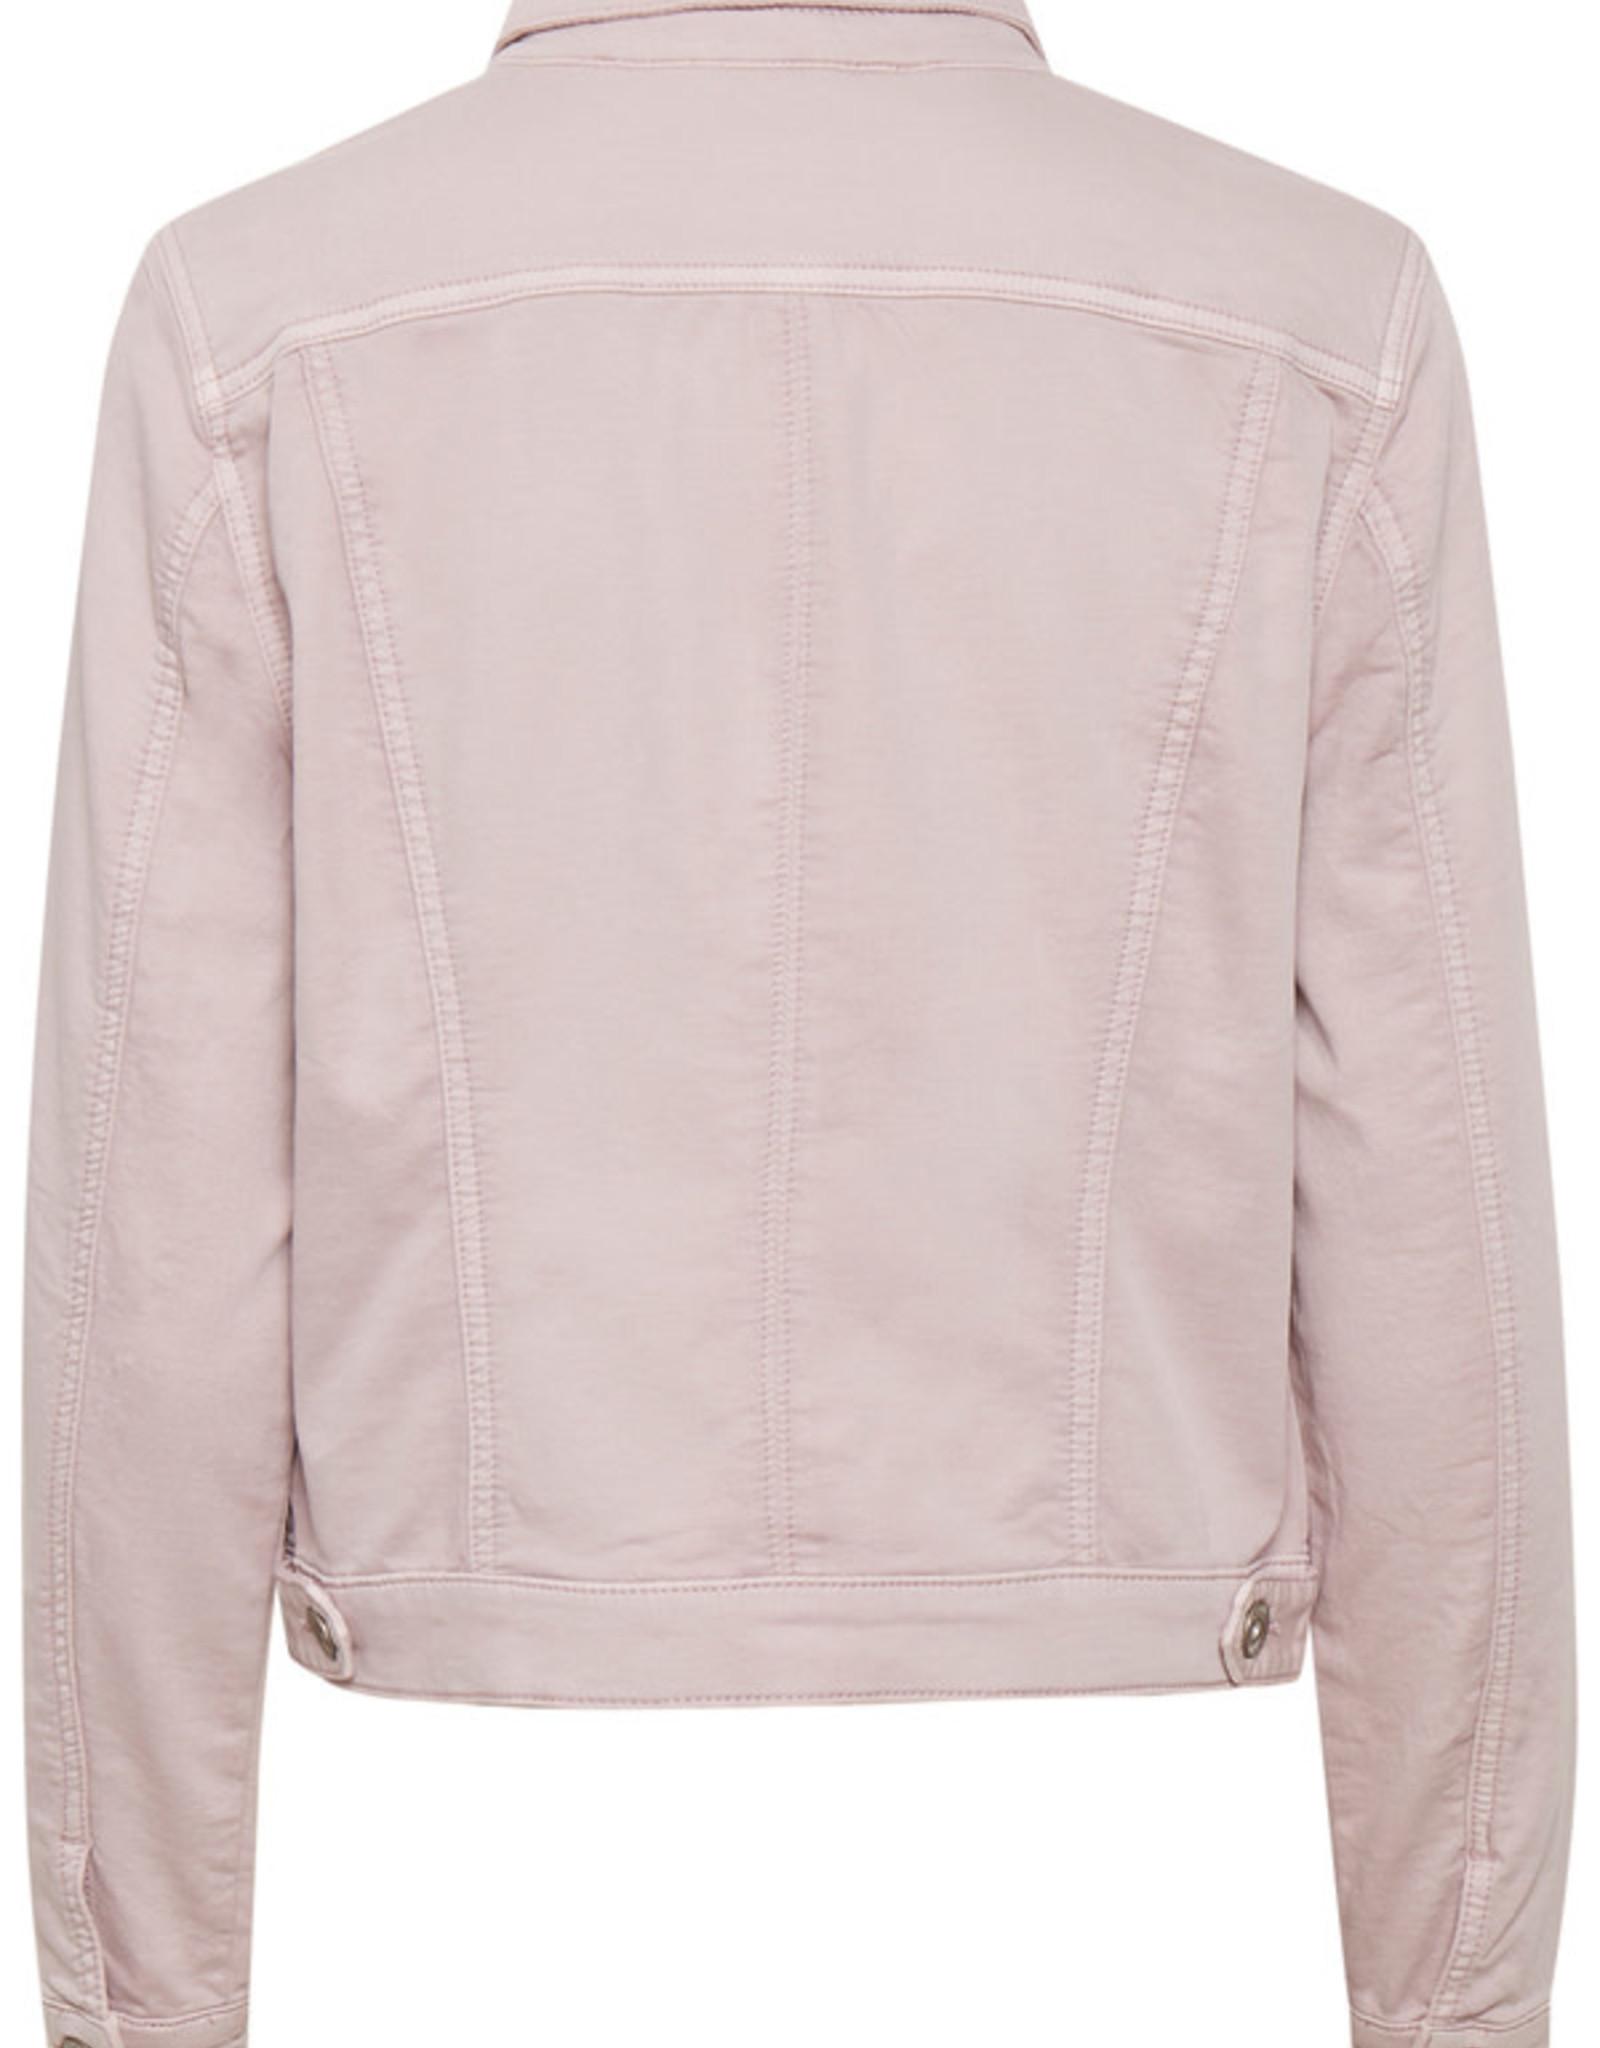 Cream Cream- RikkaCR Jacket